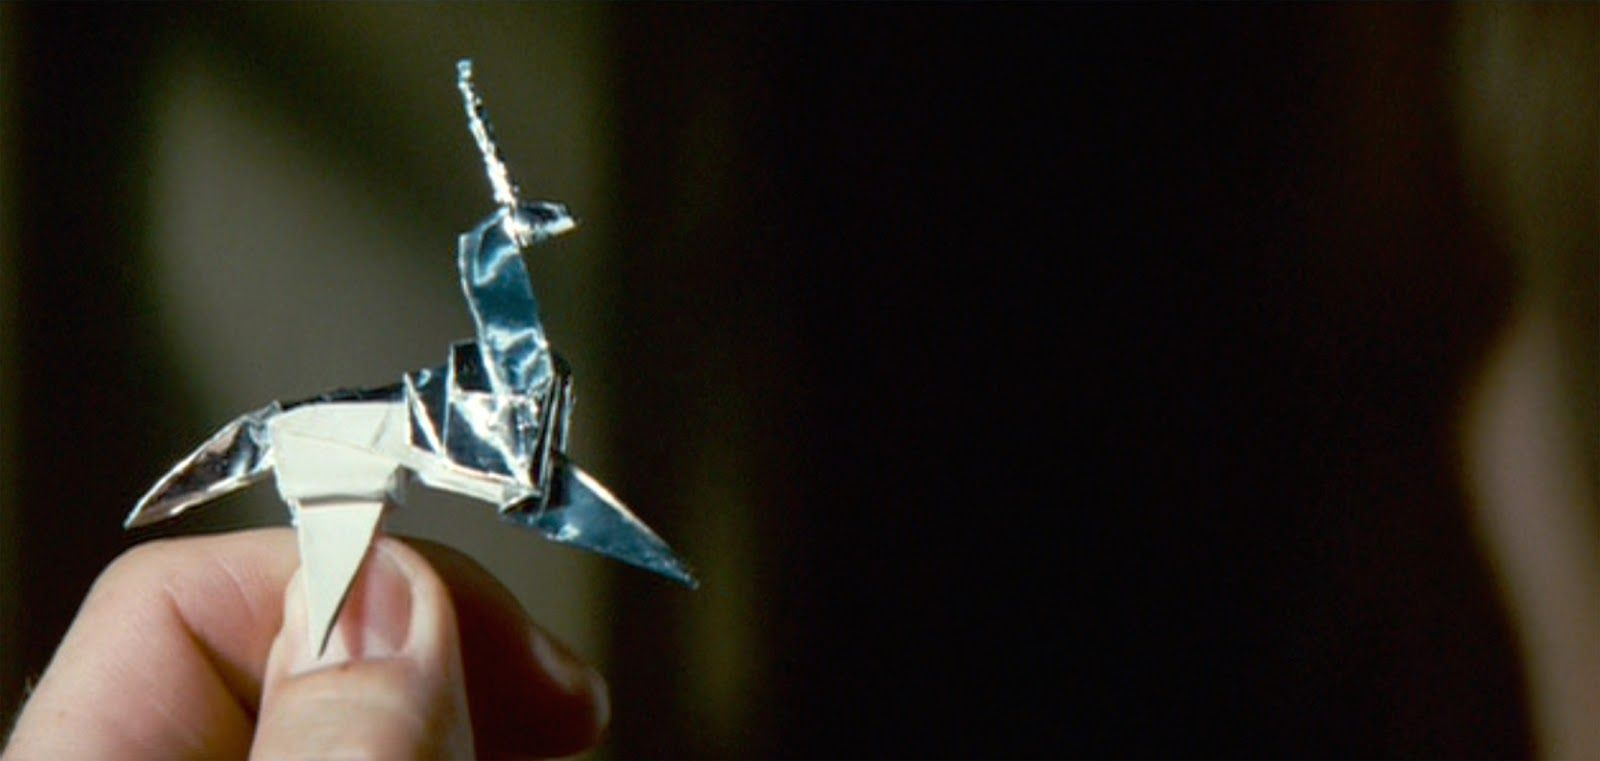 Blade Runner Origami Unicorn Pin: Does Deckard Dream Of Origami Unicorns? In 2019